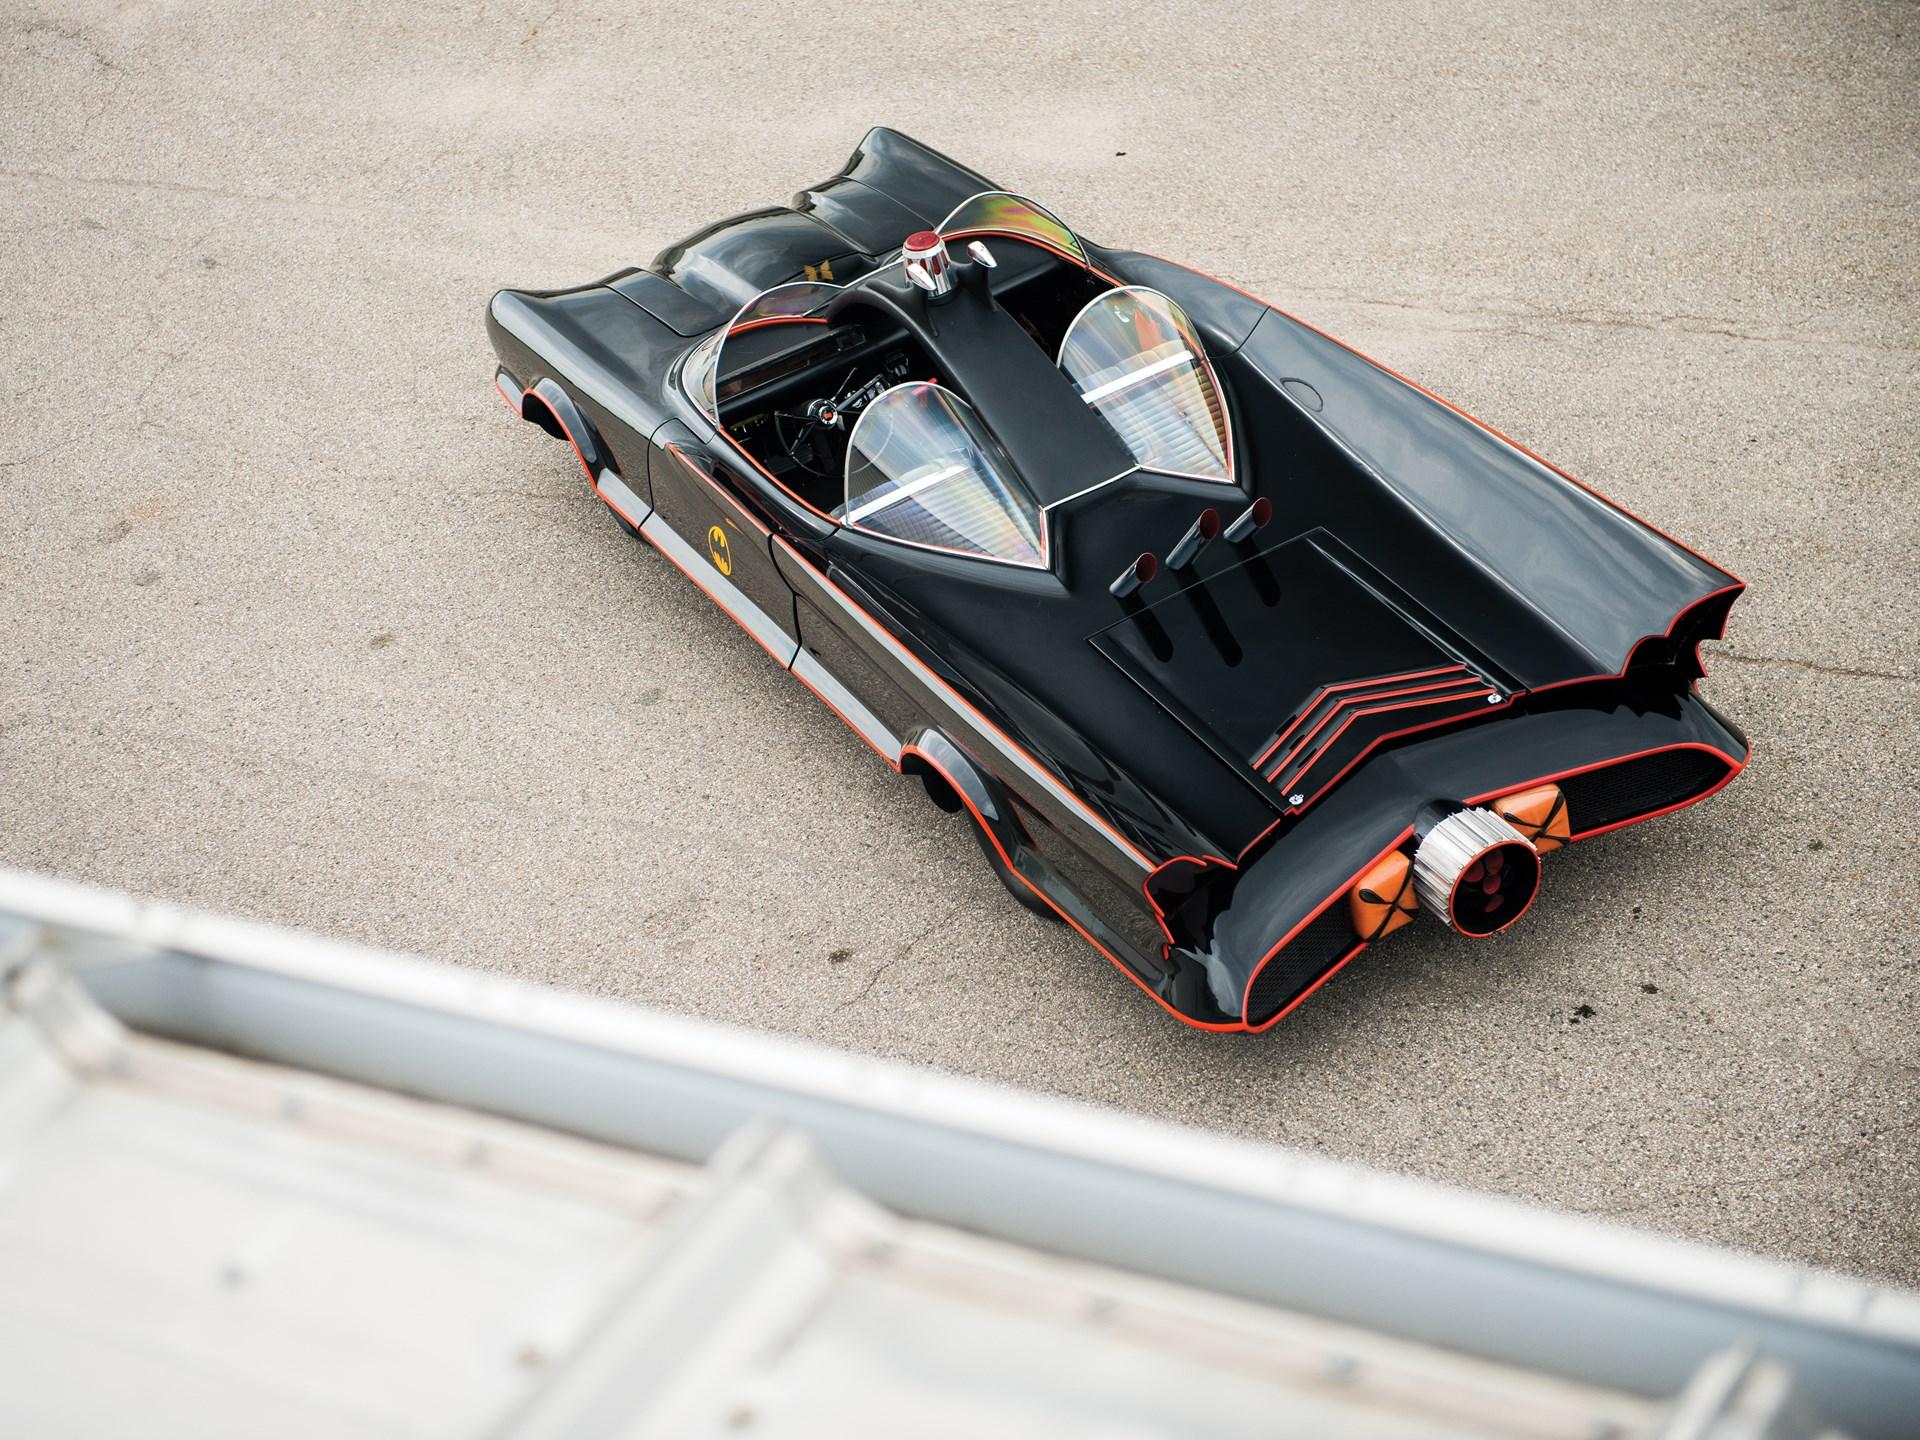 1966 Batmobile Recreation